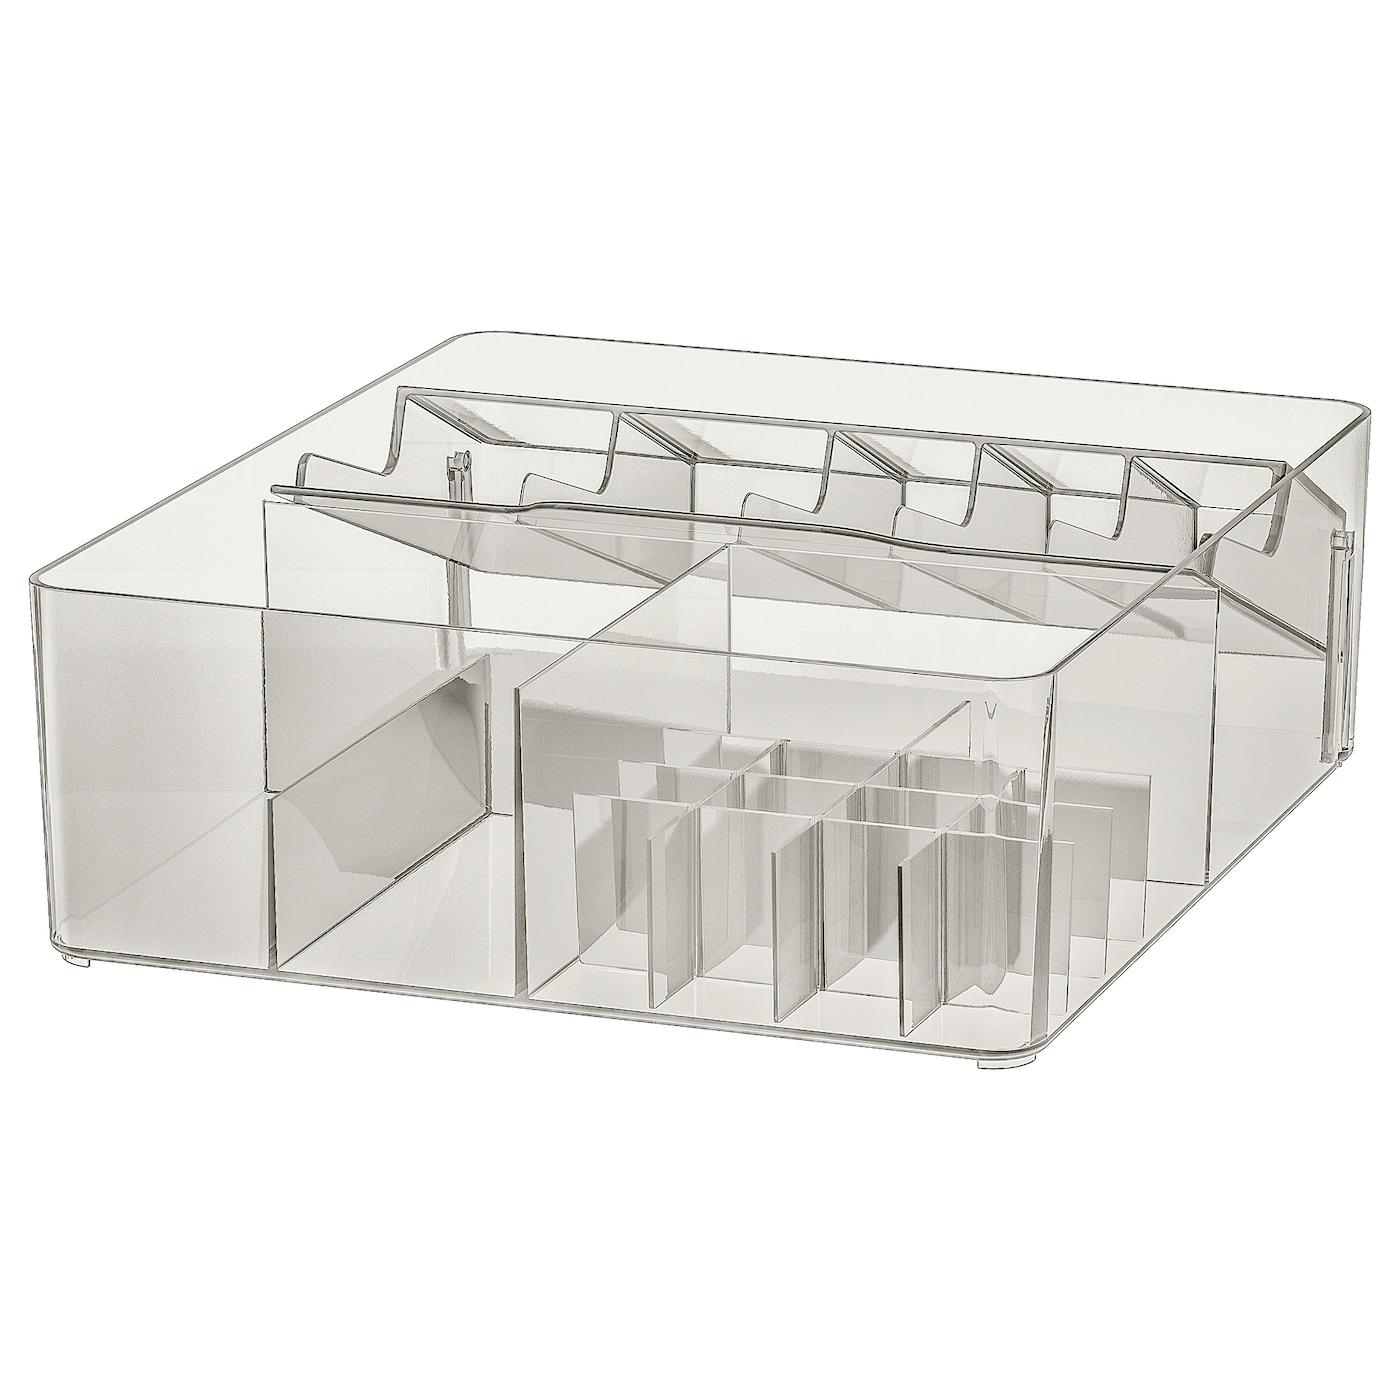 IKEA グモロン ボックス 仕切り付き